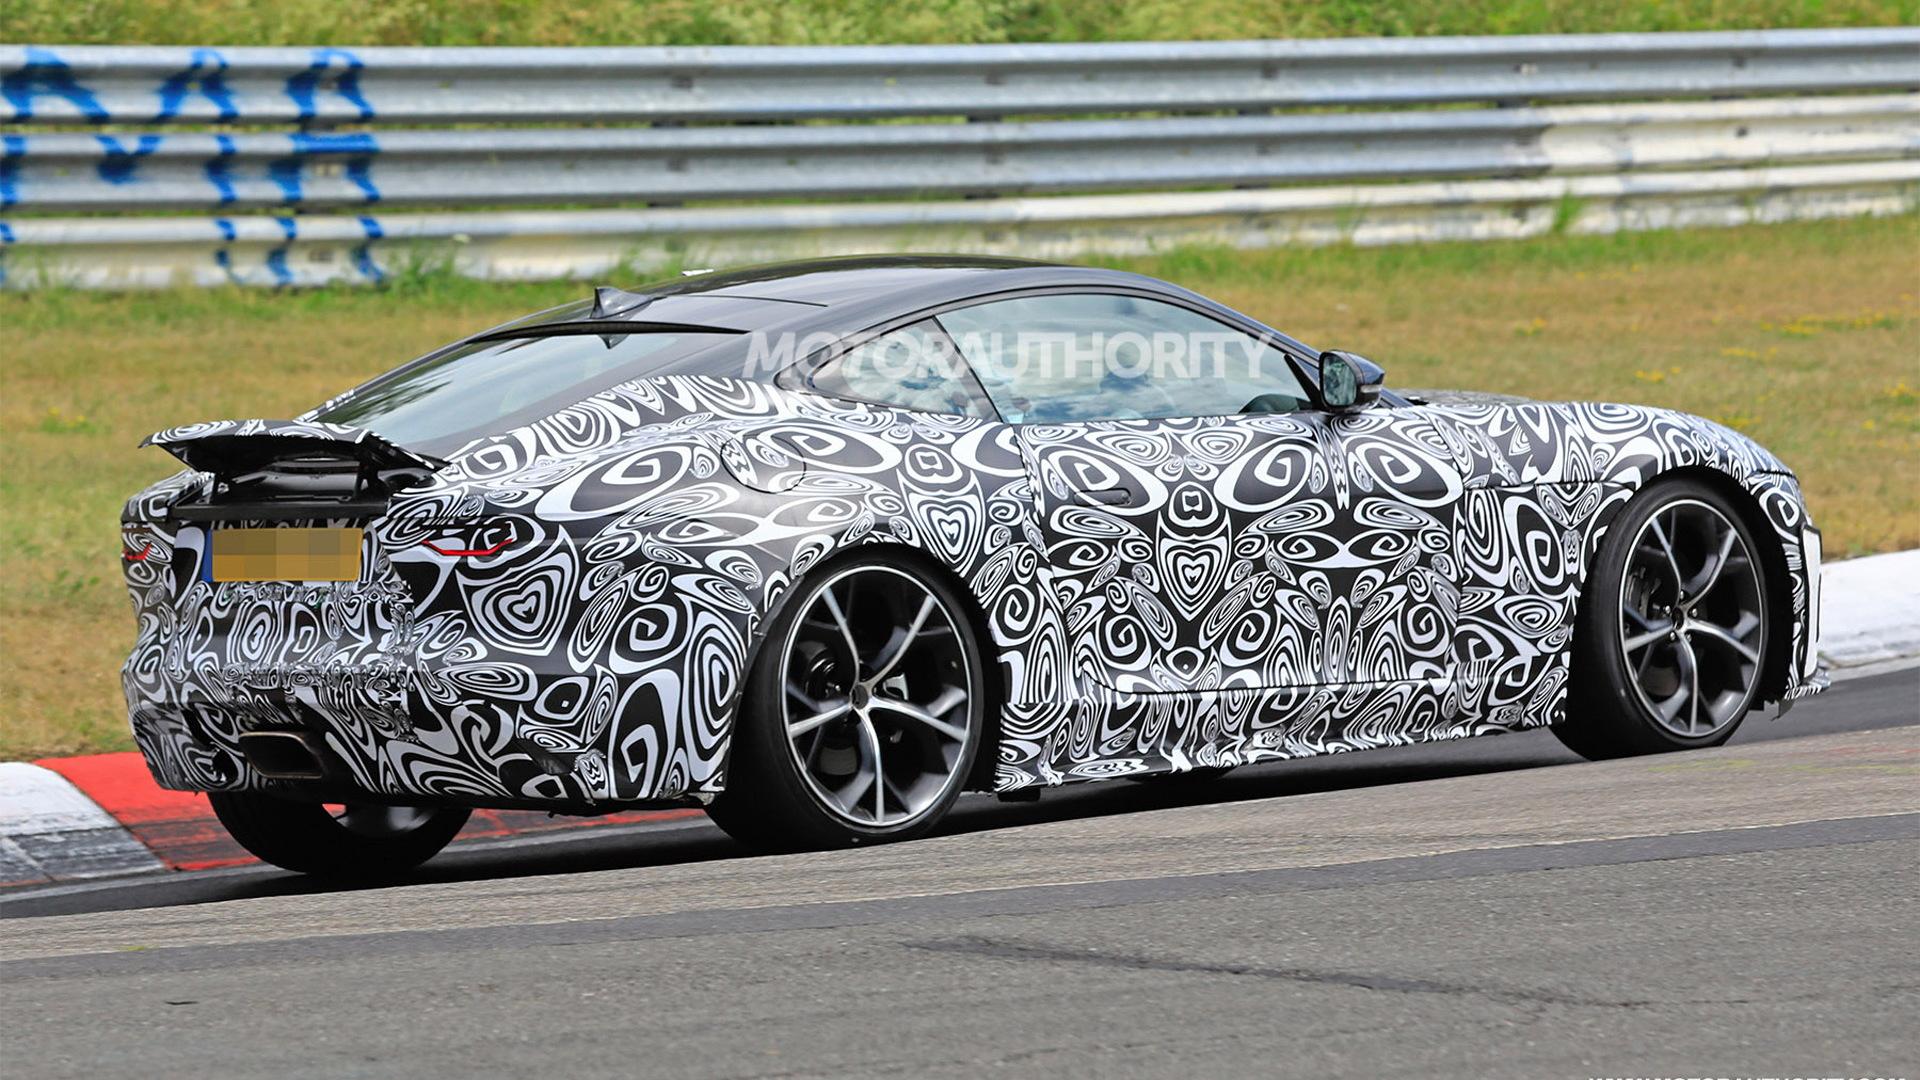 2021 Jaguar F-Type spy shots - Image via S. Baldauf/SB-Medien